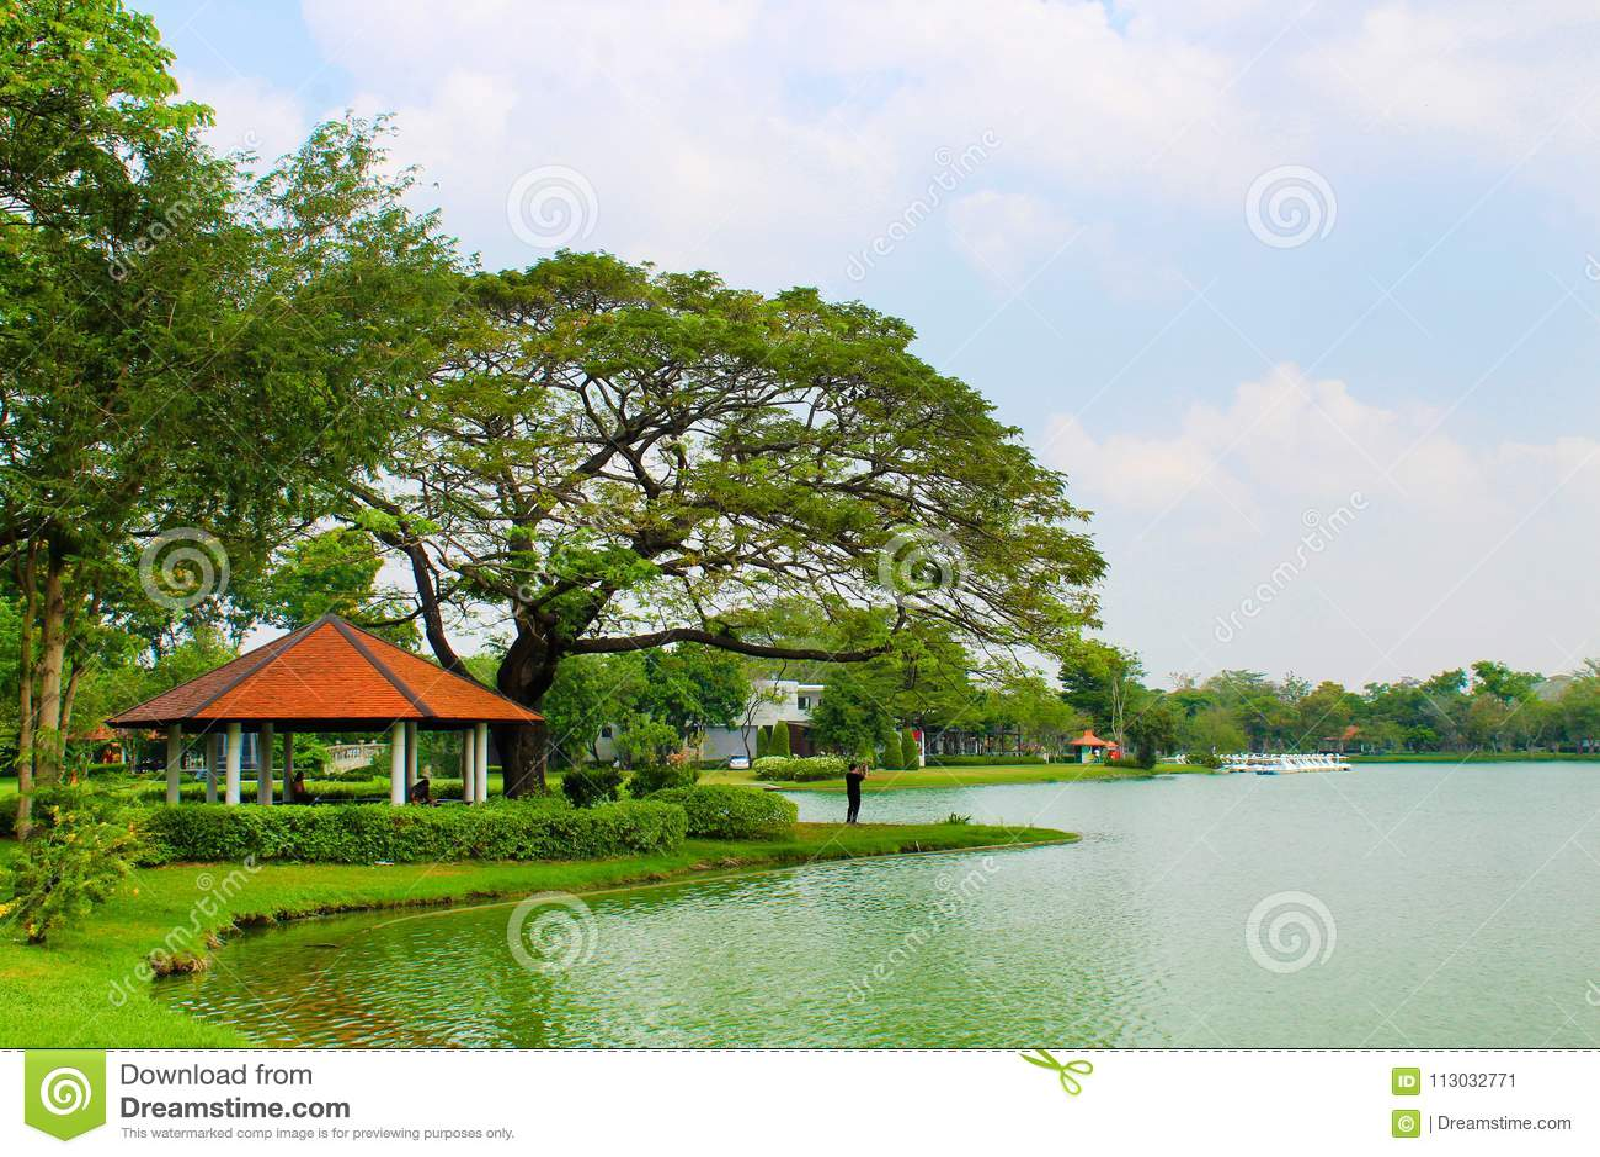 Lago Lumpini en el parque de Lumpini, Tailandia